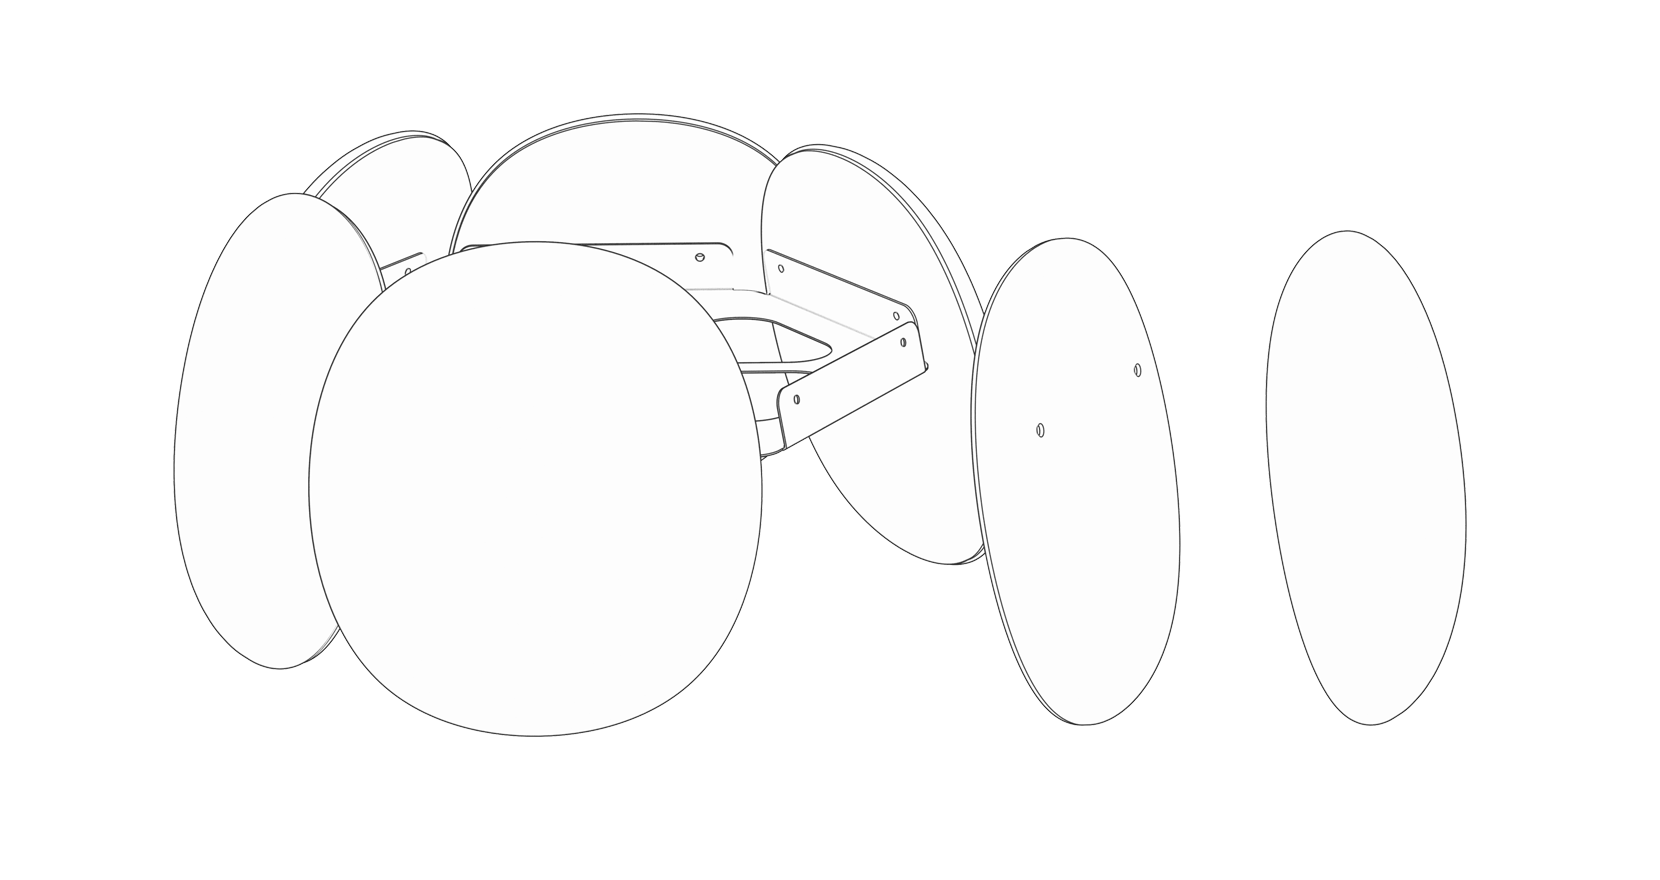 Blossom_pendantlamp_buildup copy